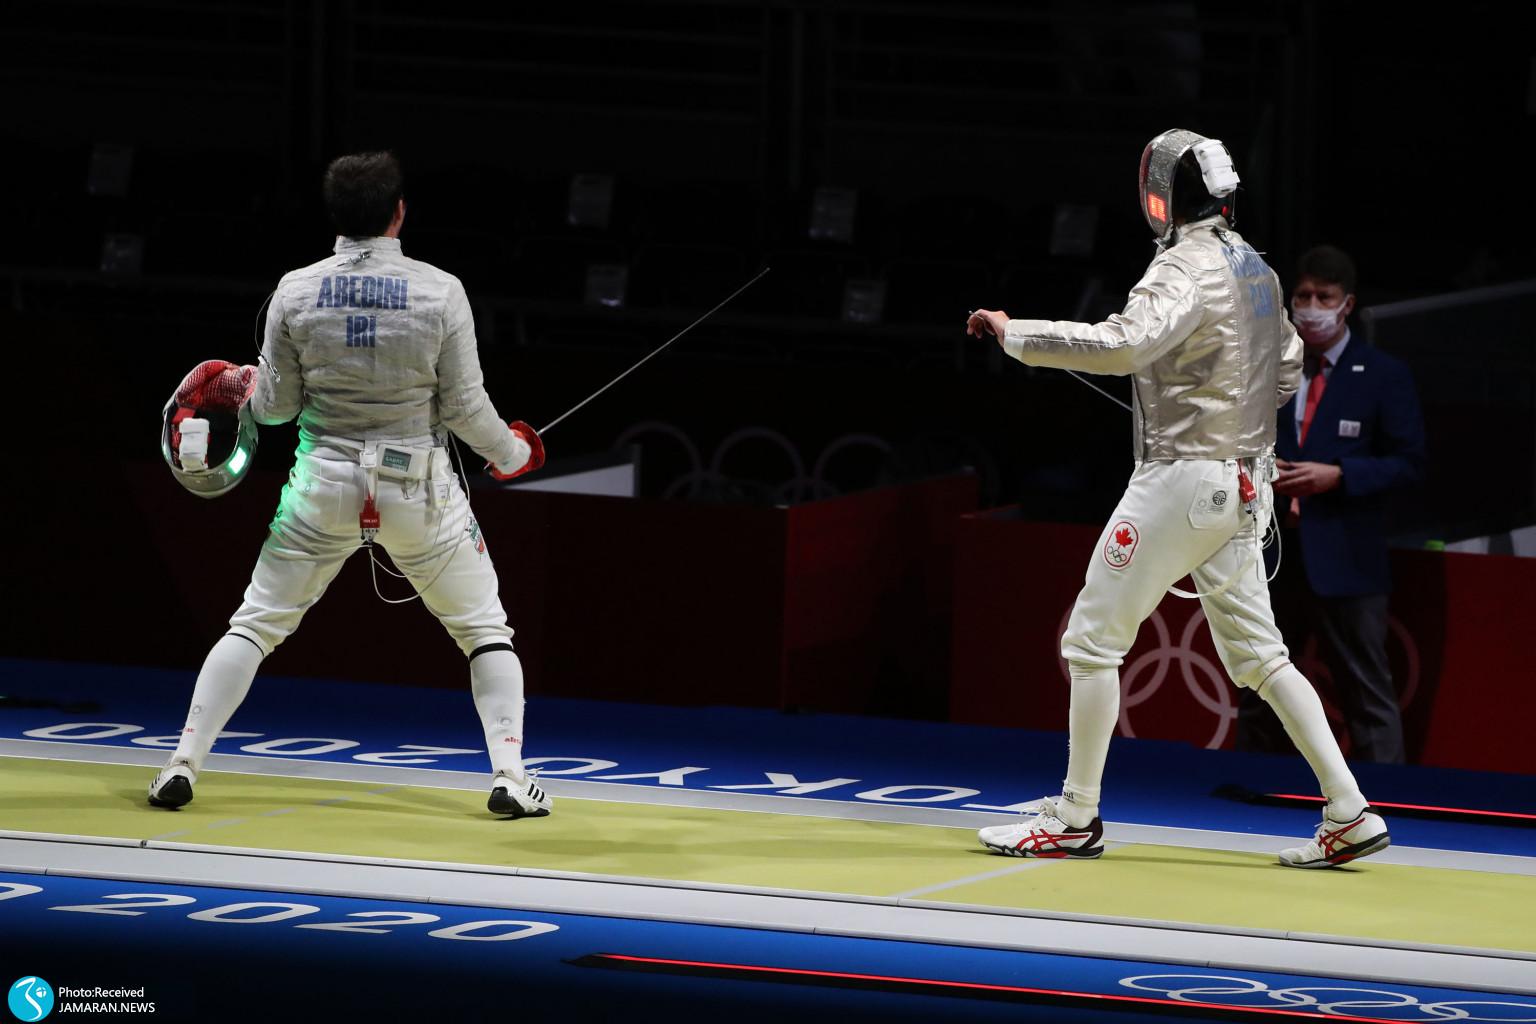 مجتبی عابدینی شمشیربازی المپیک